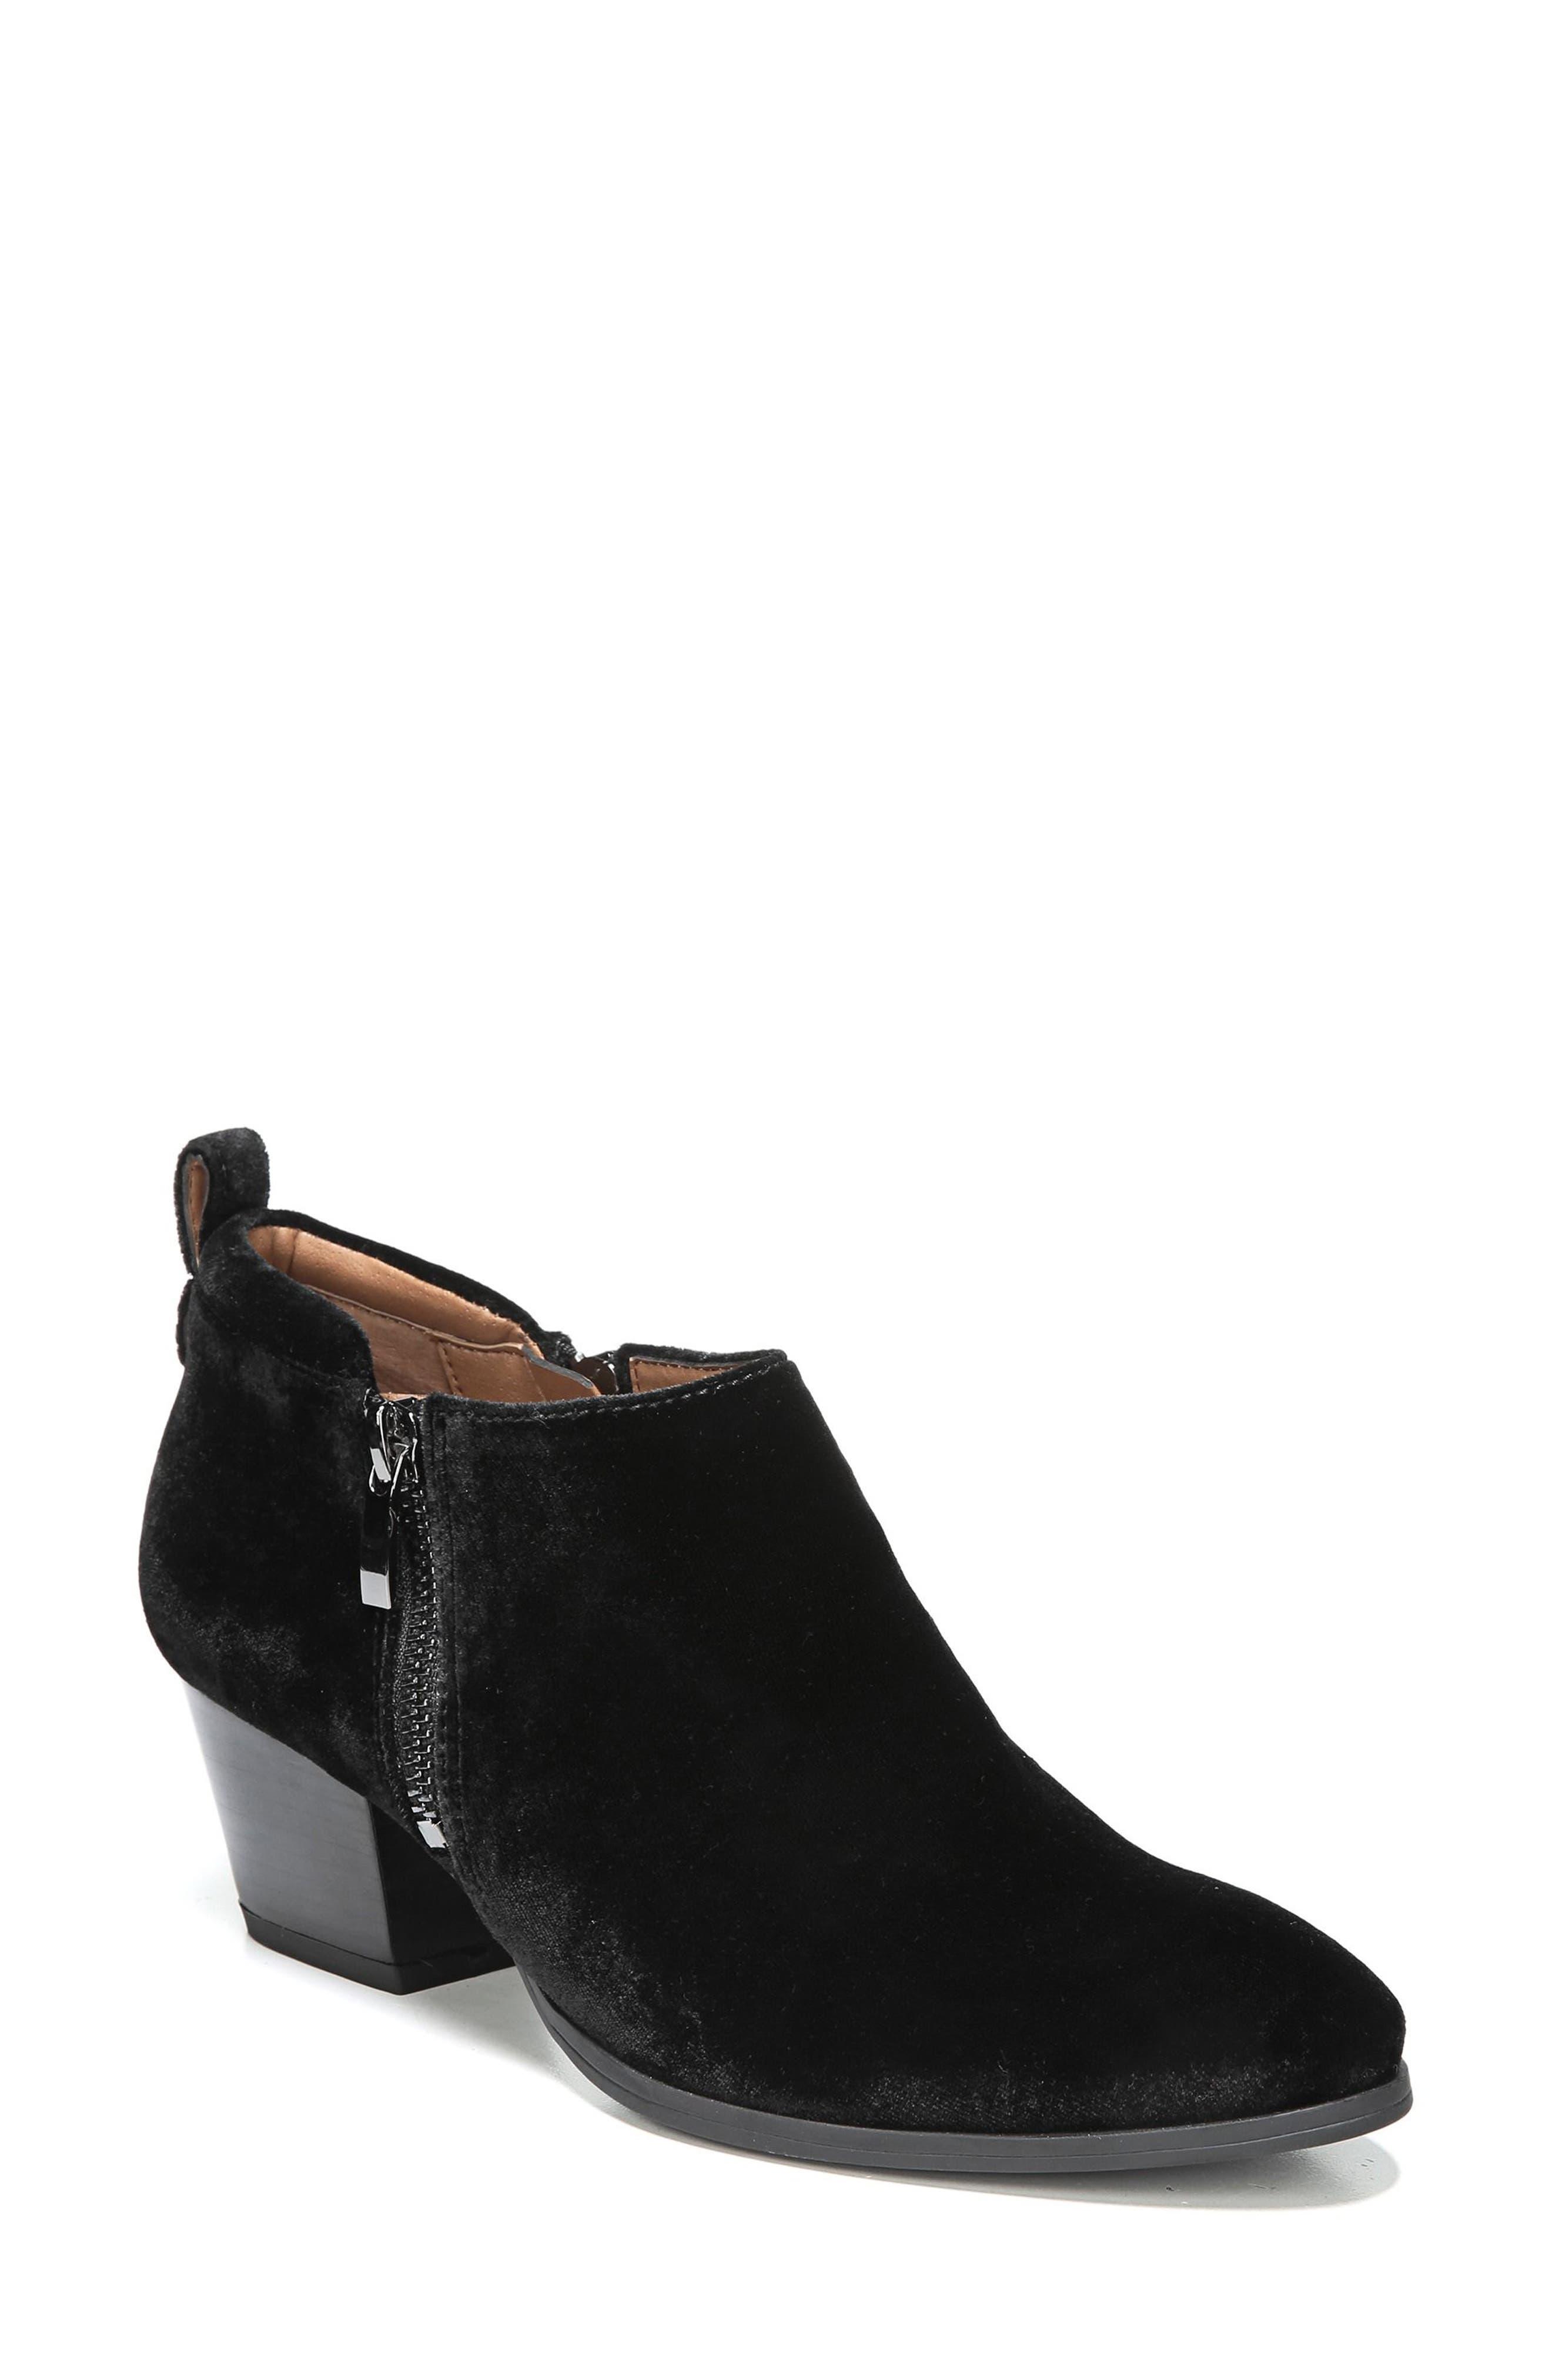 'Granite' Block Heel Bootie,                             Main thumbnail 1, color,                             Black Velvet